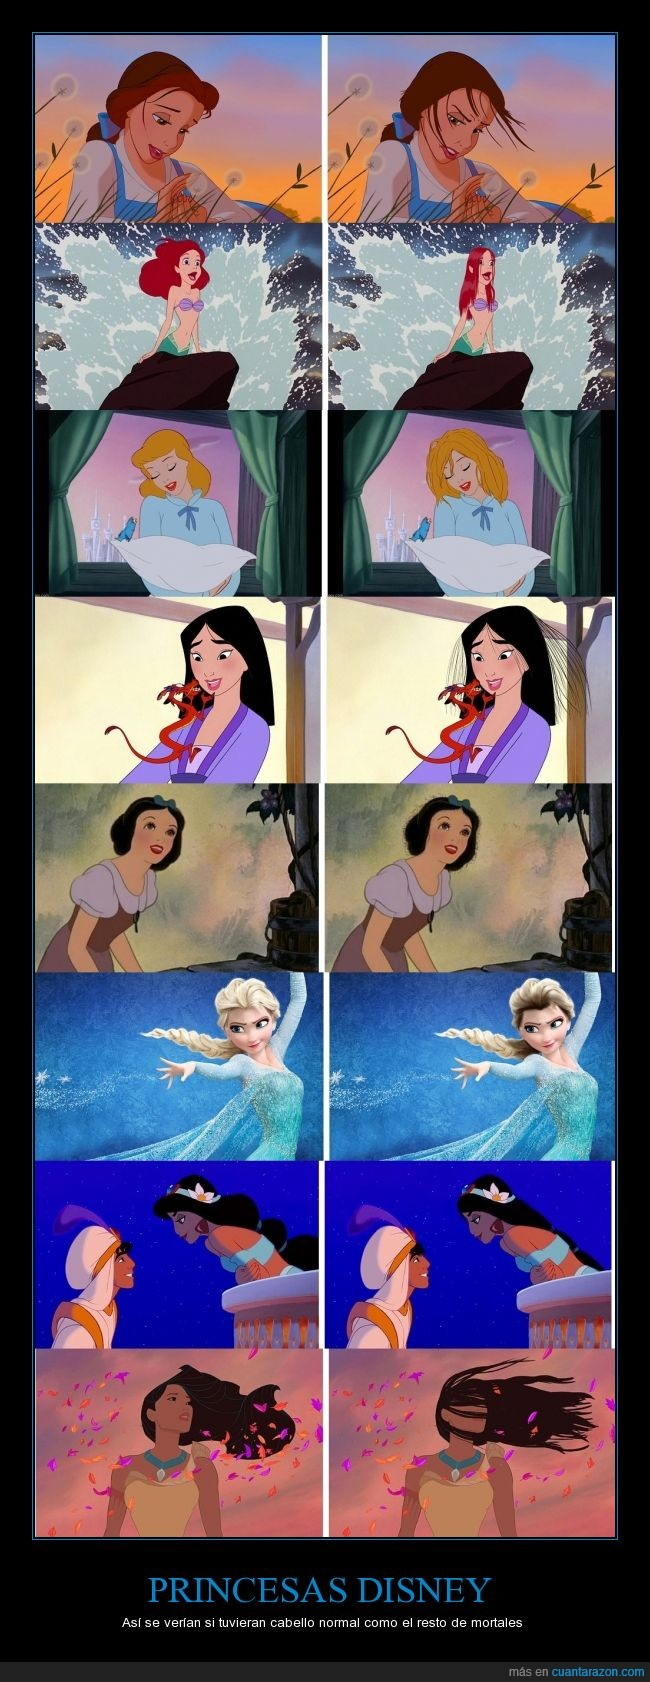 bella,Blancanieves,cabello,disney,mojado,pelo,princesas,real,sirenita